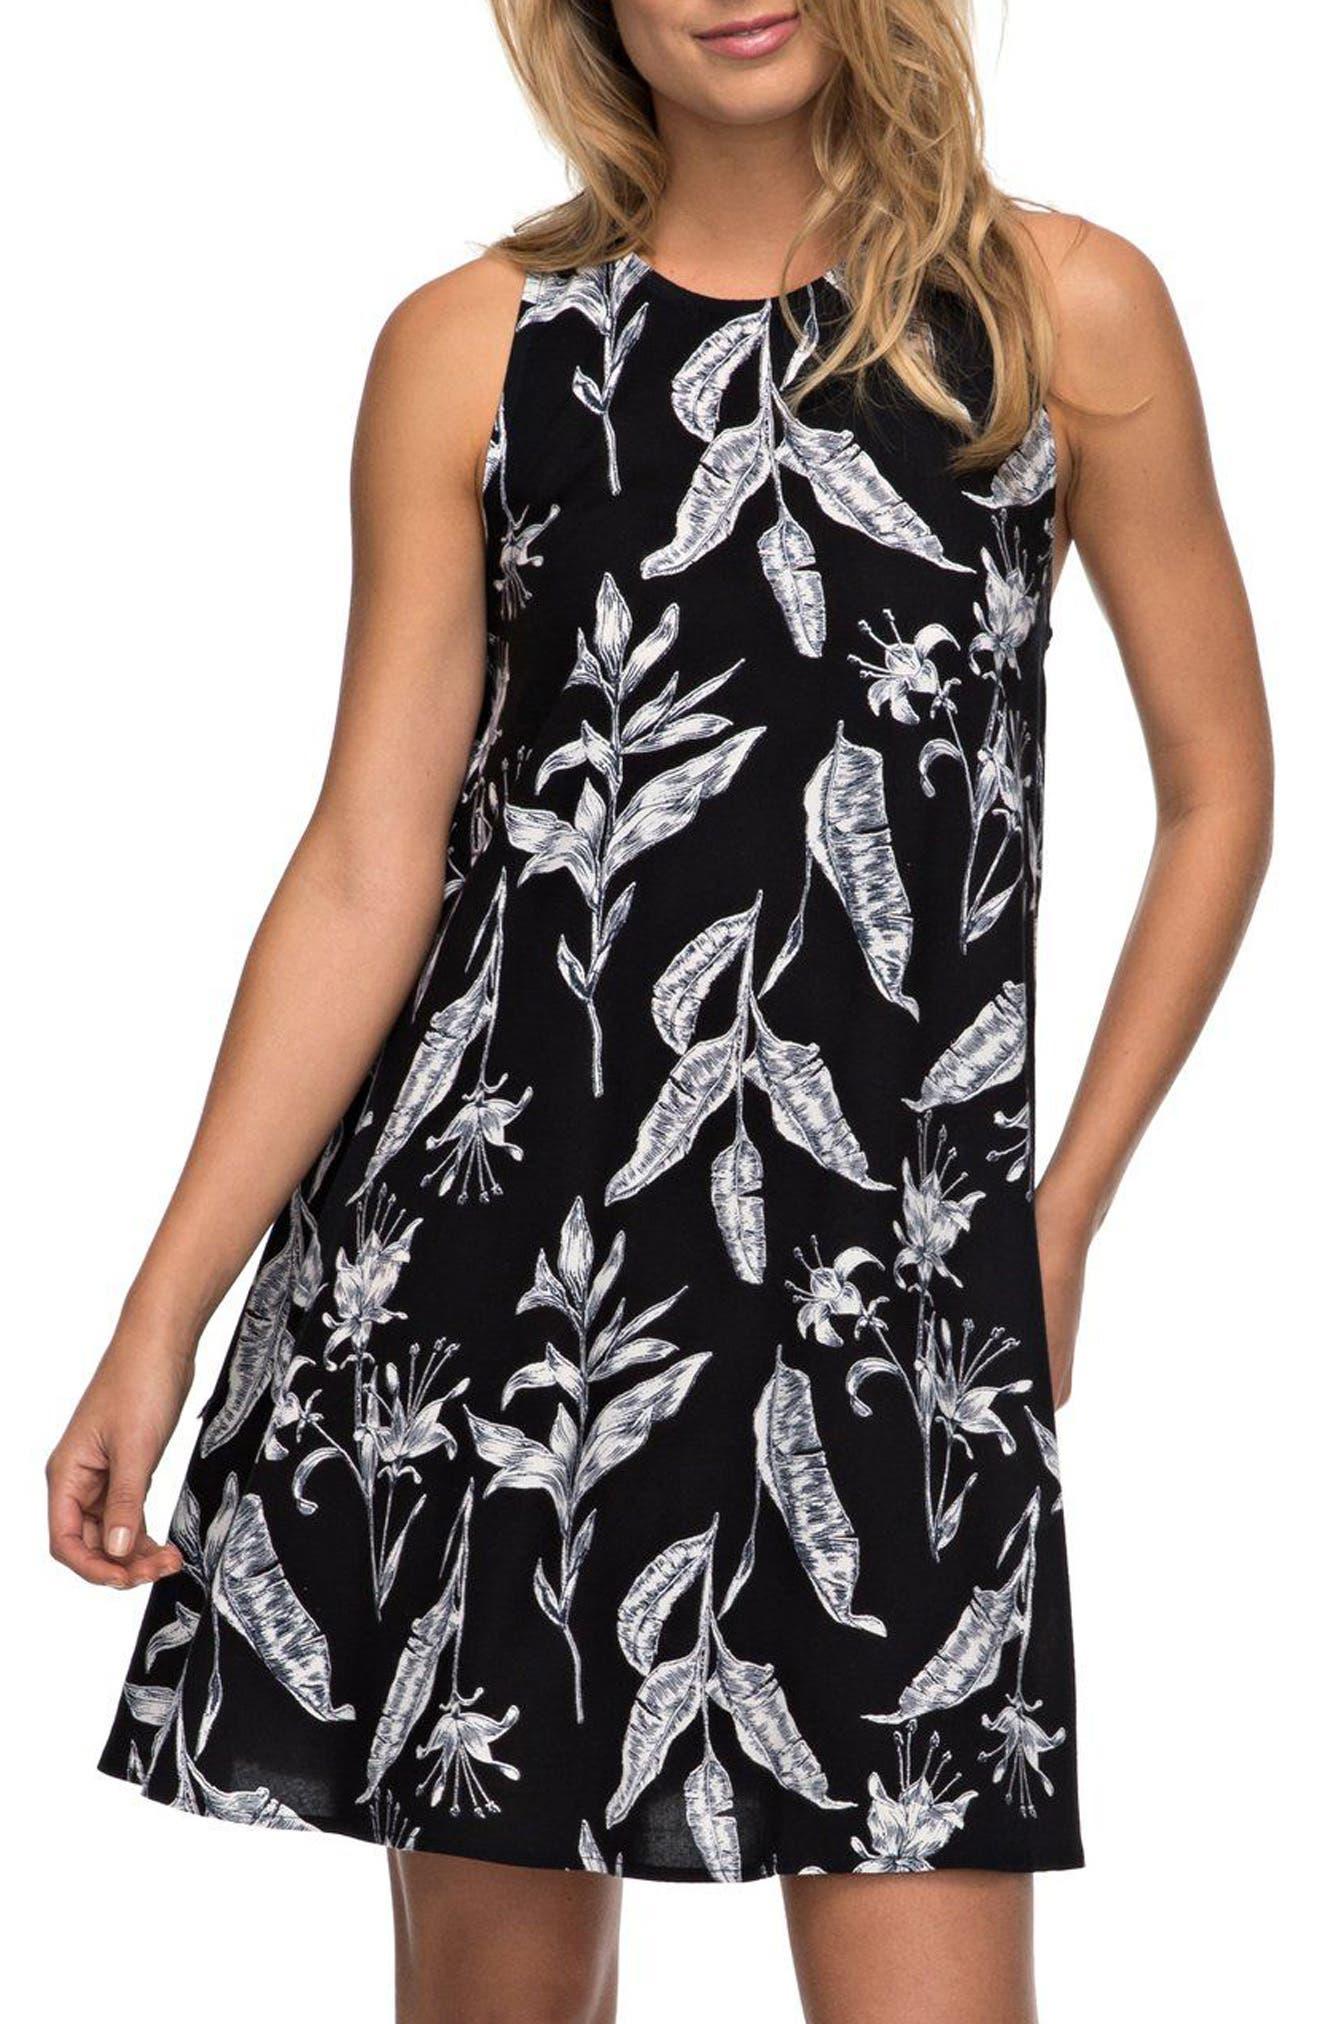 Tomorrow's Dress,                         Main,                         color, 002